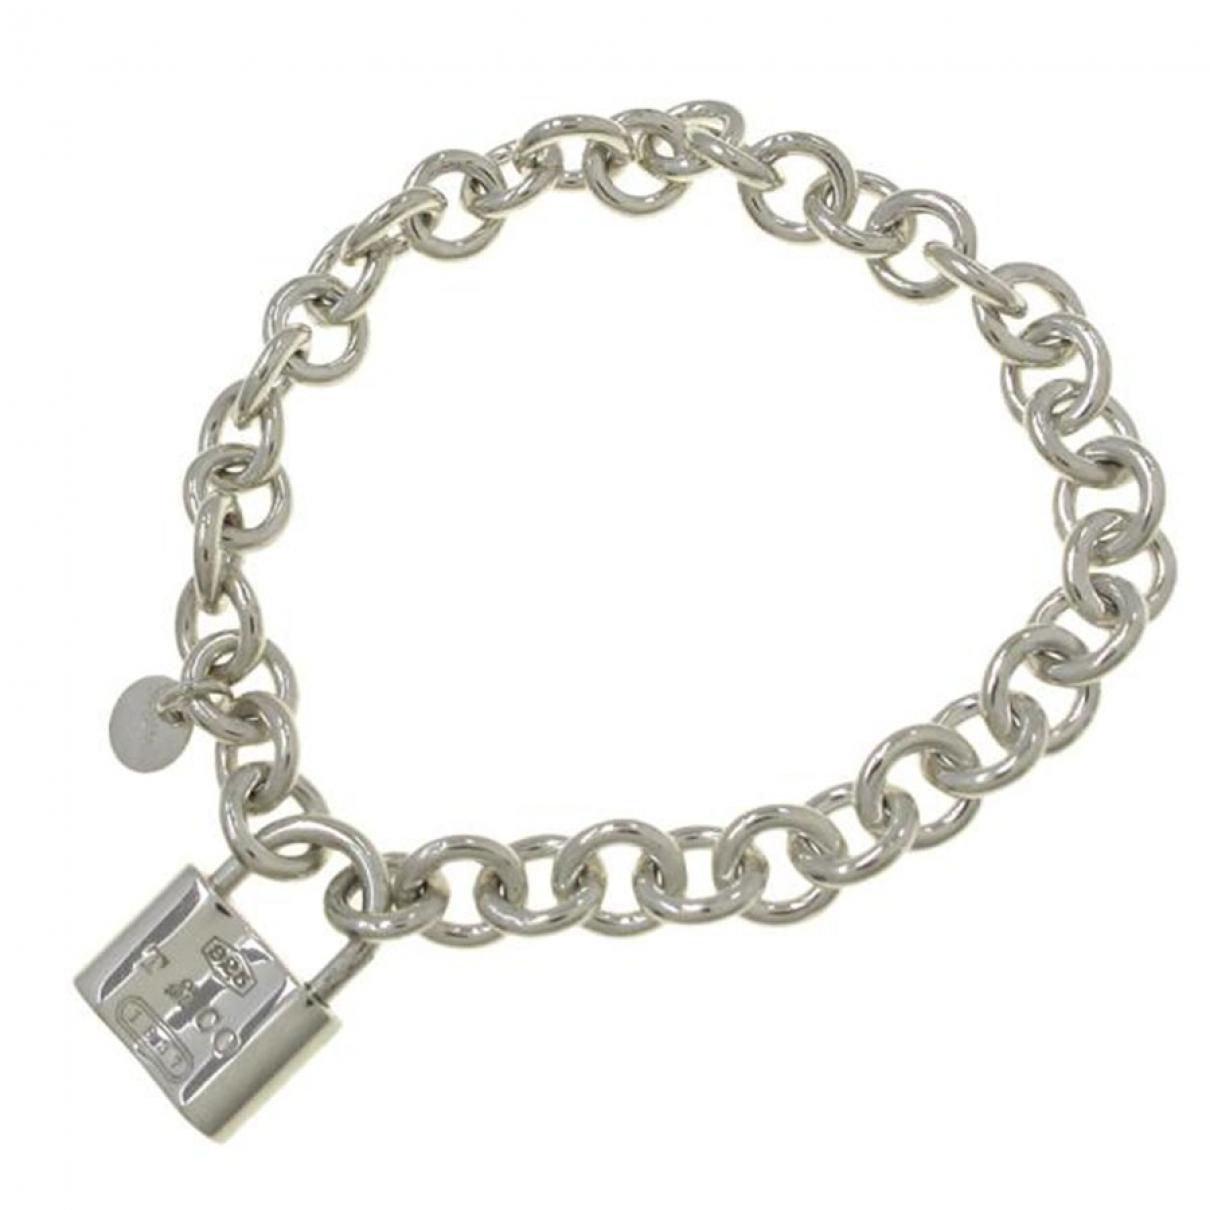 Tiffany & Co Tiffany 1837 Armband in Silber